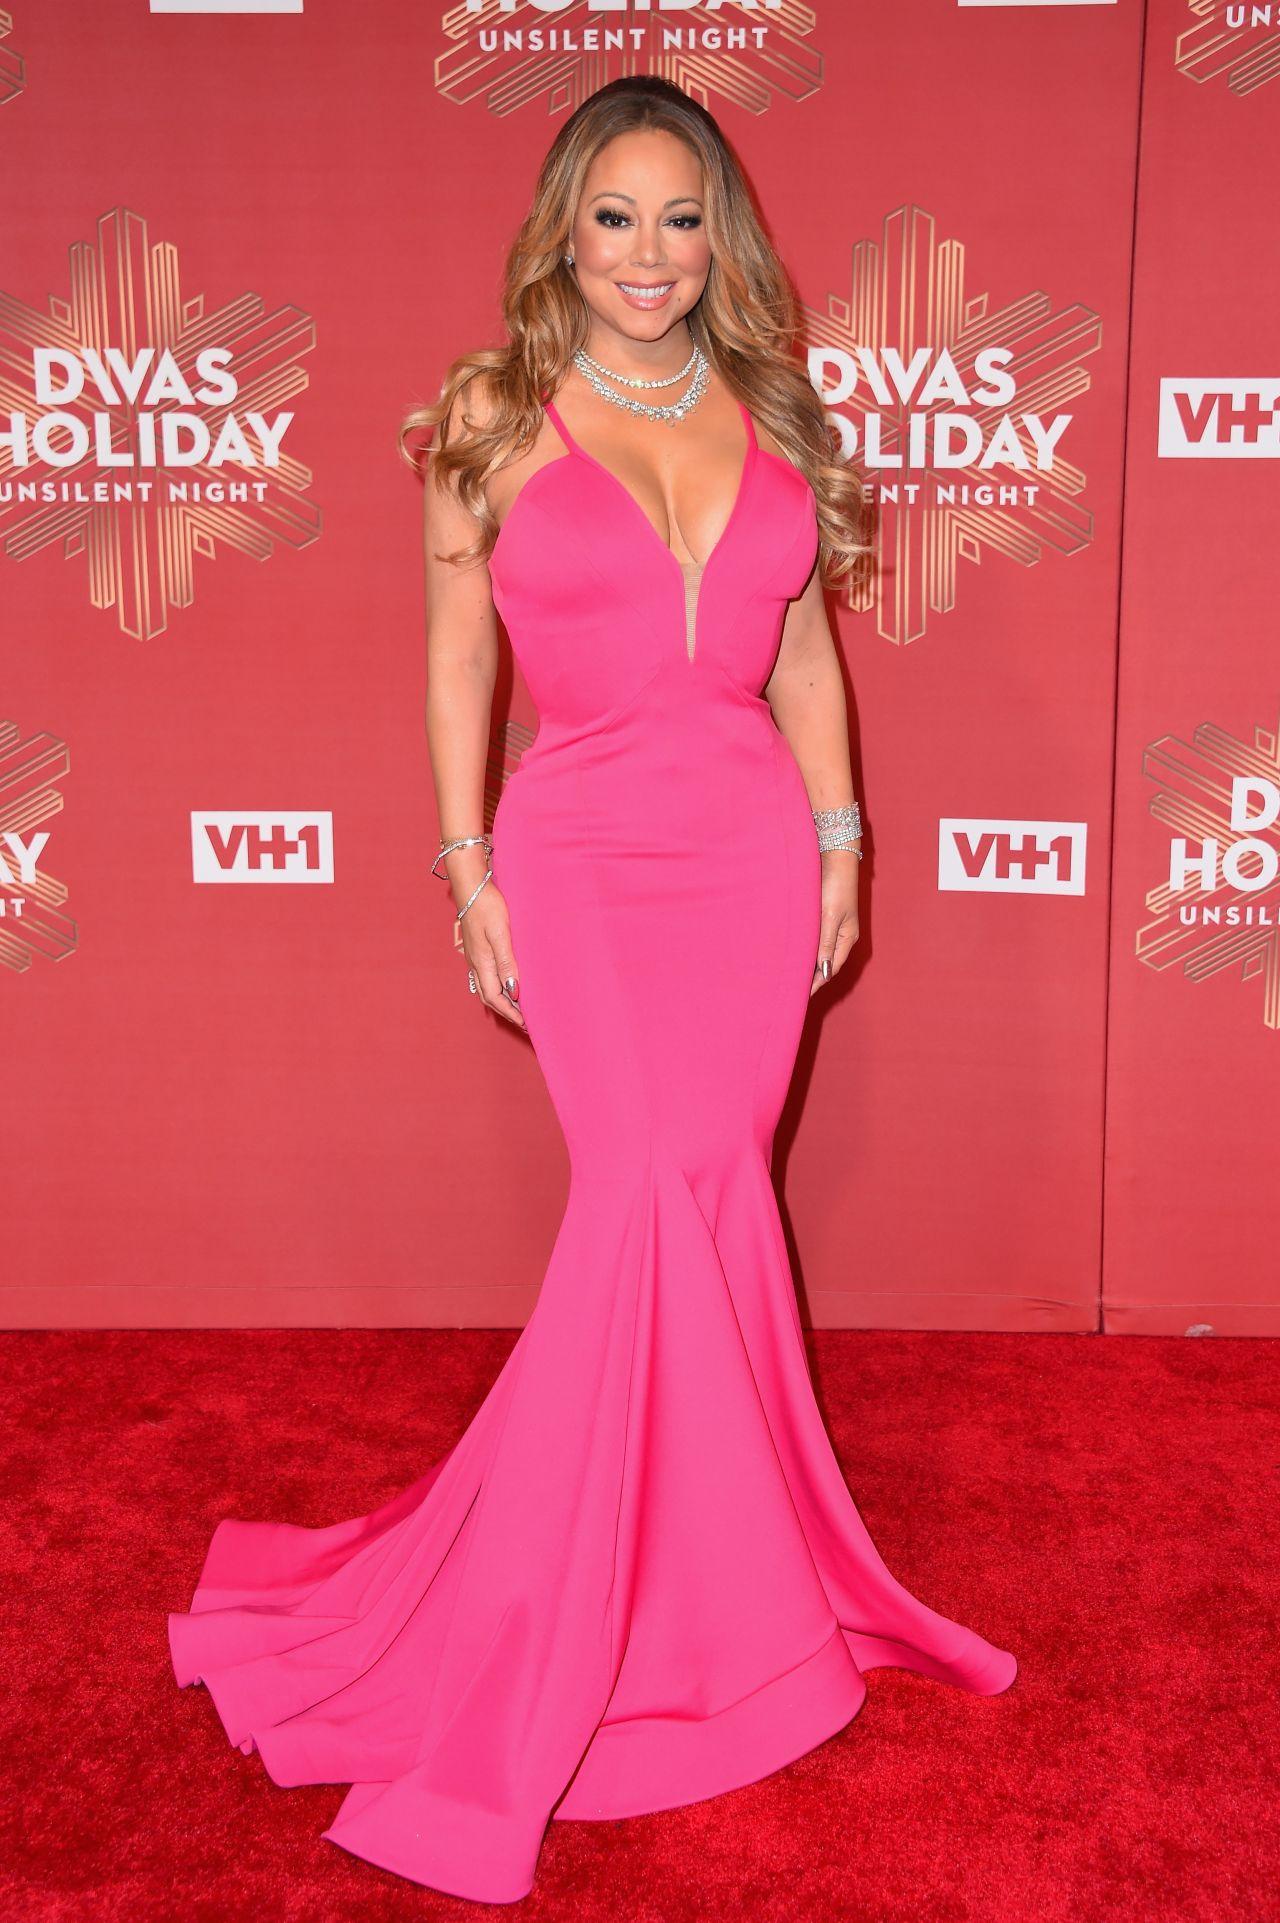 Mariah Carey 2016 VH1s Divas Holiday Unsilent Night In